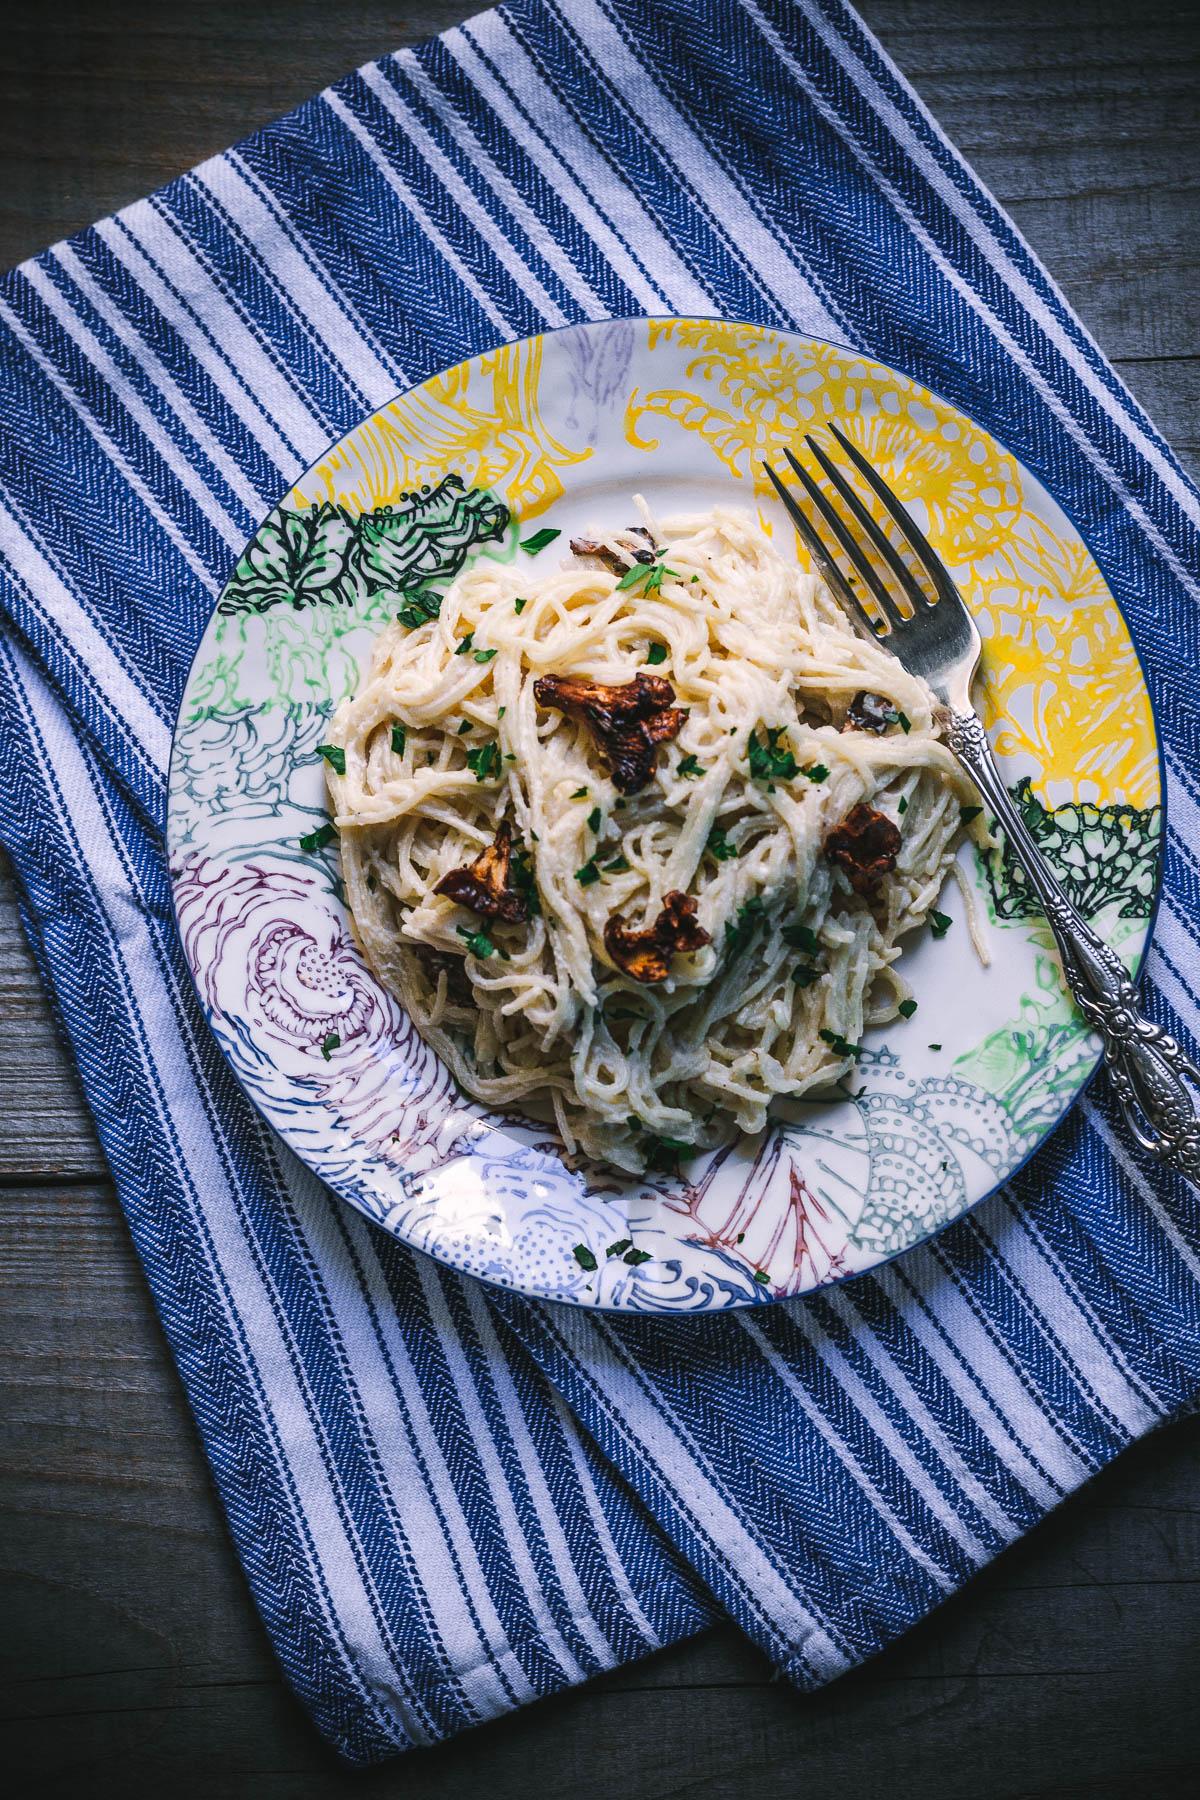 mississippi vegan chanterelle pasta-5826 plated pasta.JPG